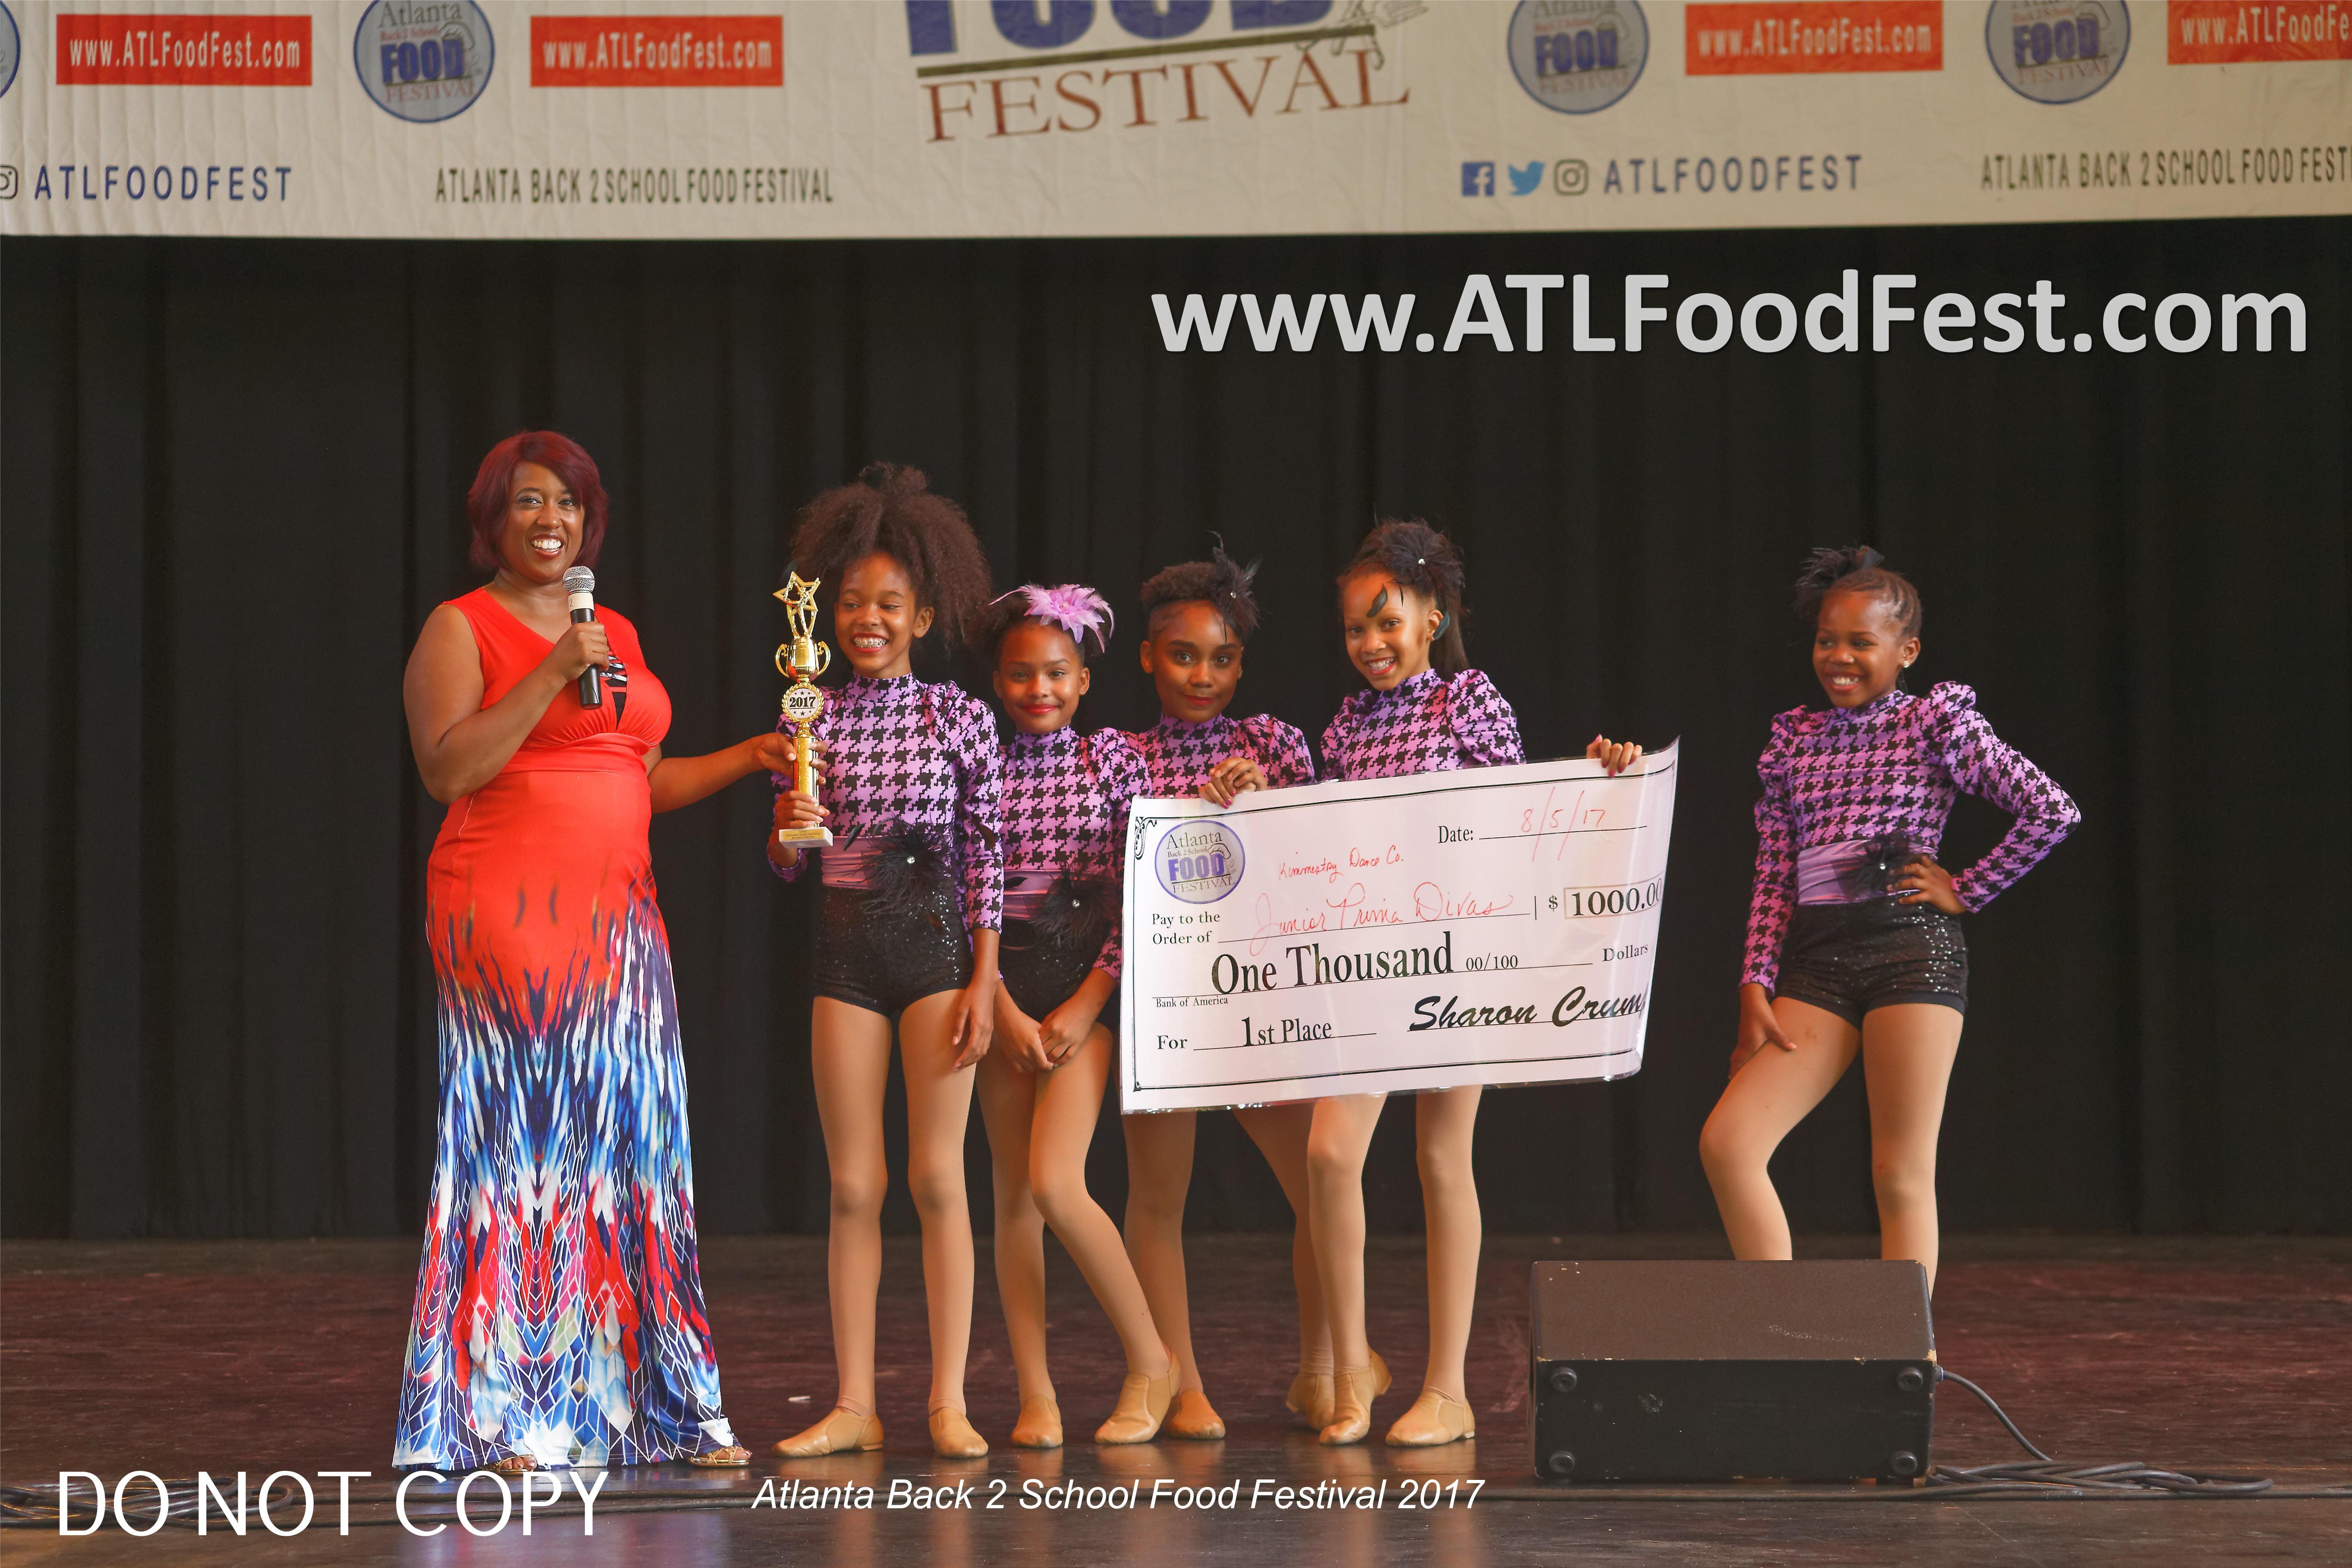 Atlanta 1st Place Winner Kids Dance